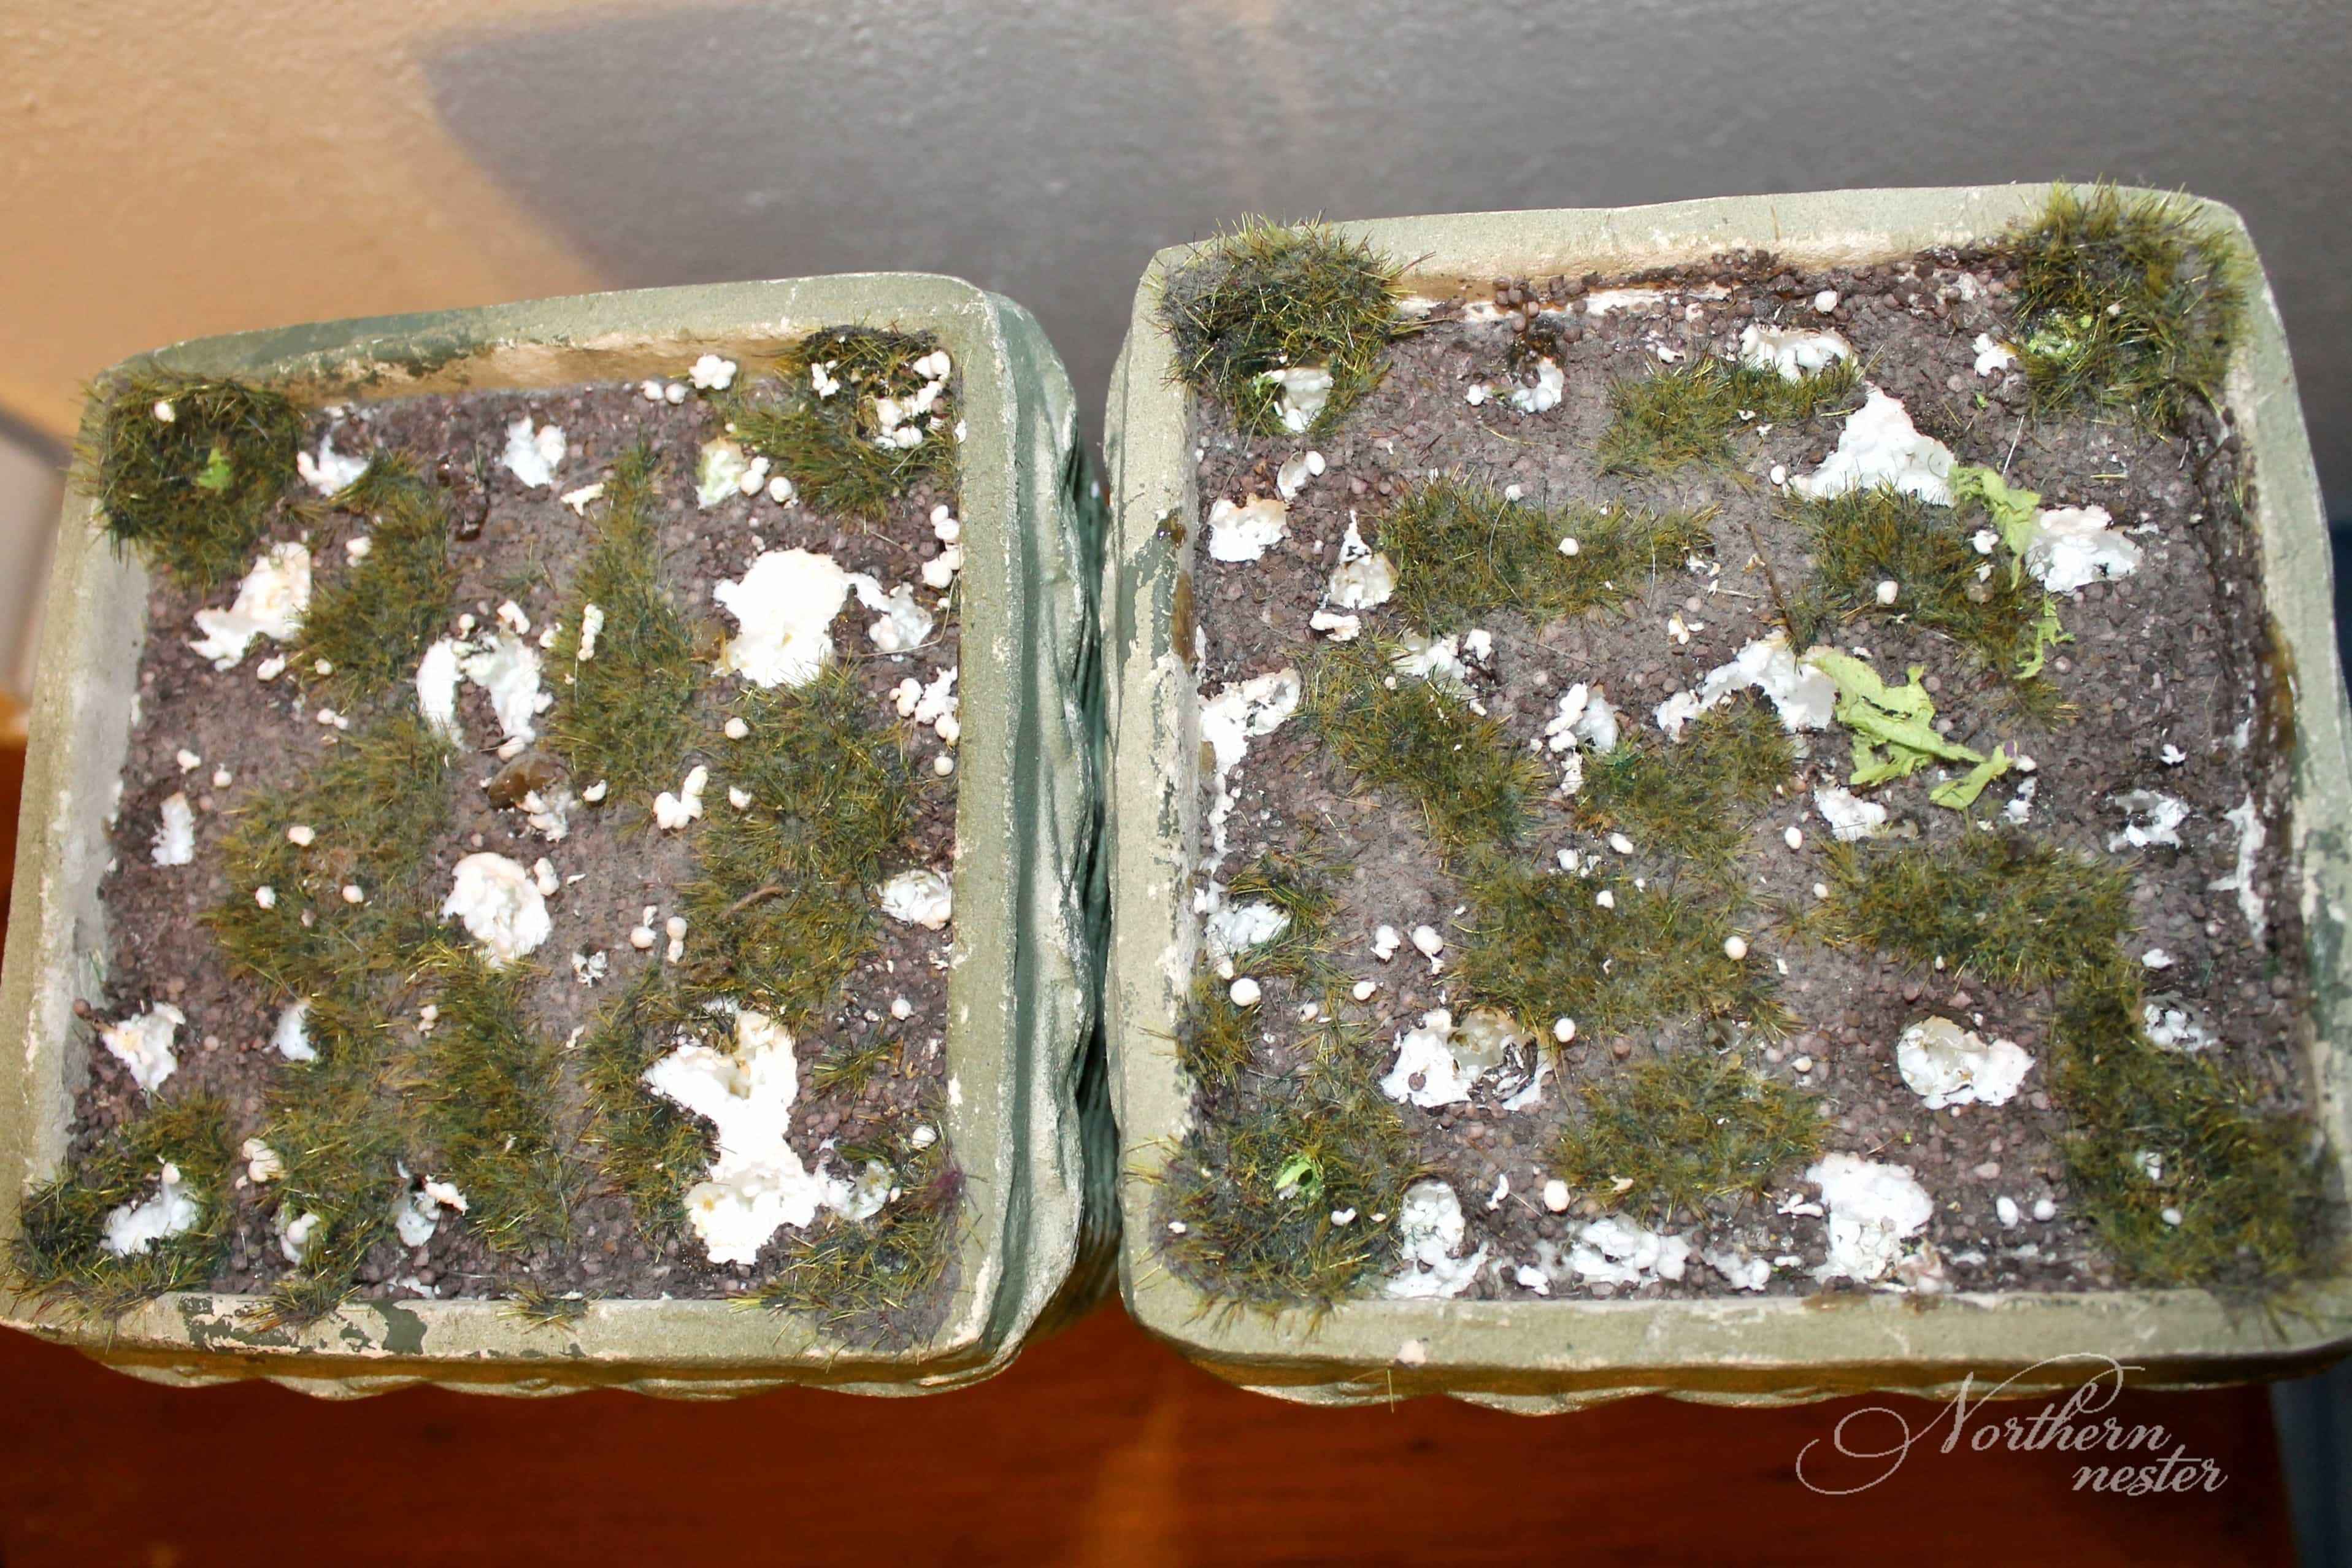 www ballard designs ballard designs bench diy ballard designs ballard designs topiary knock off northern nester topiary container